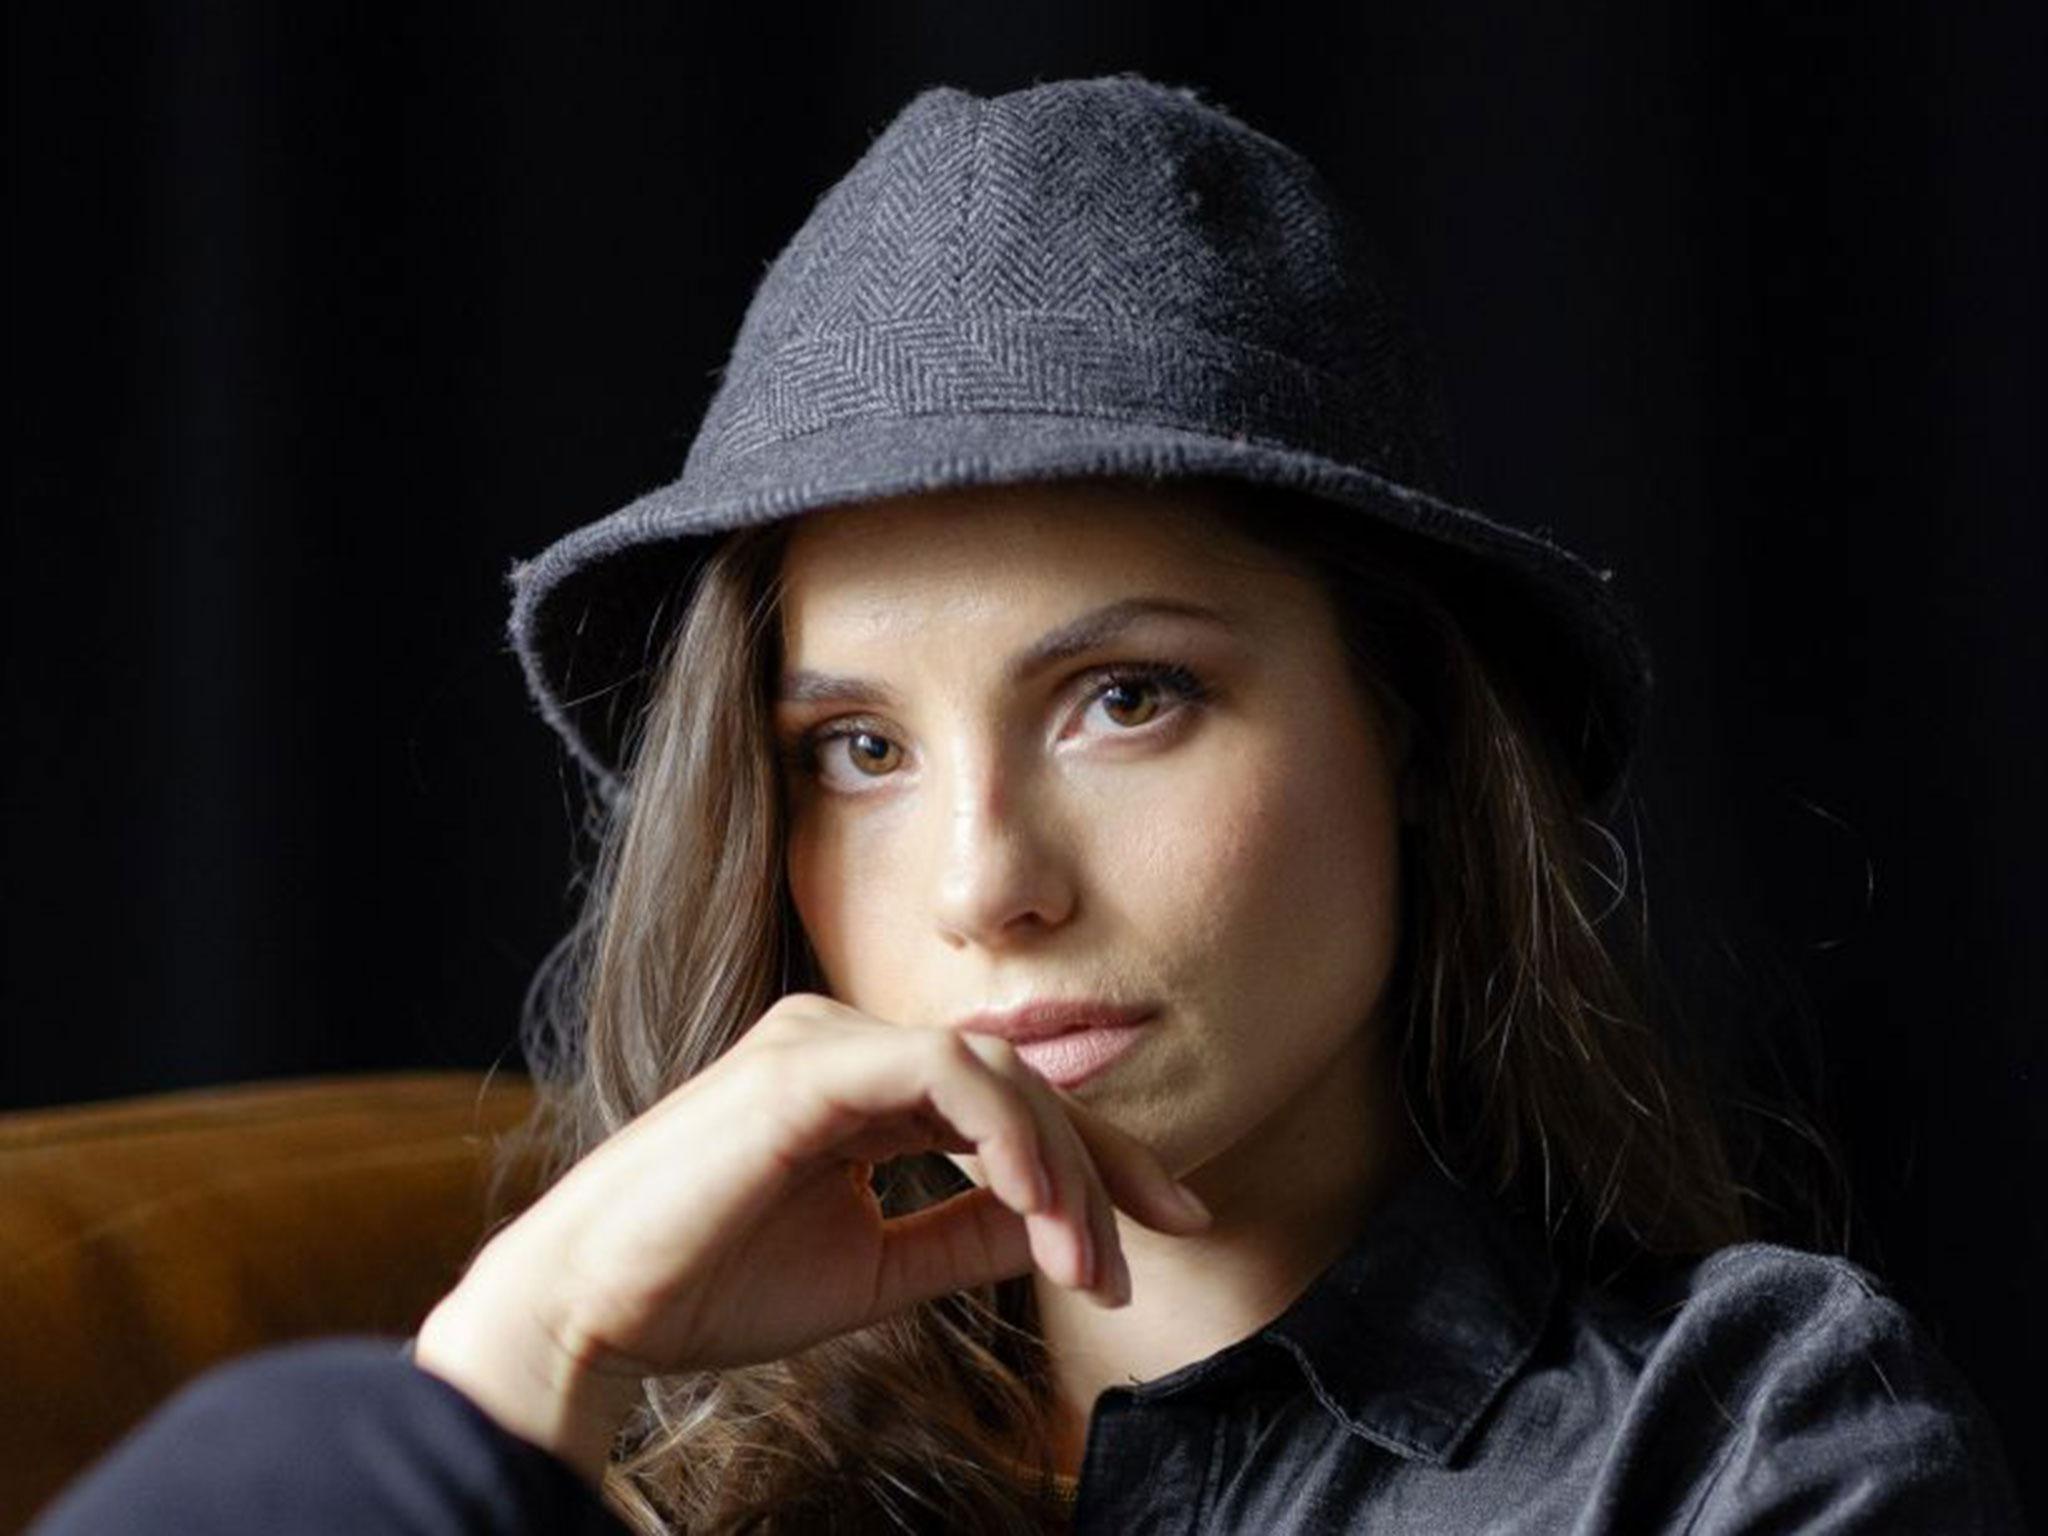 charlotte riley hat wallpaper 62663